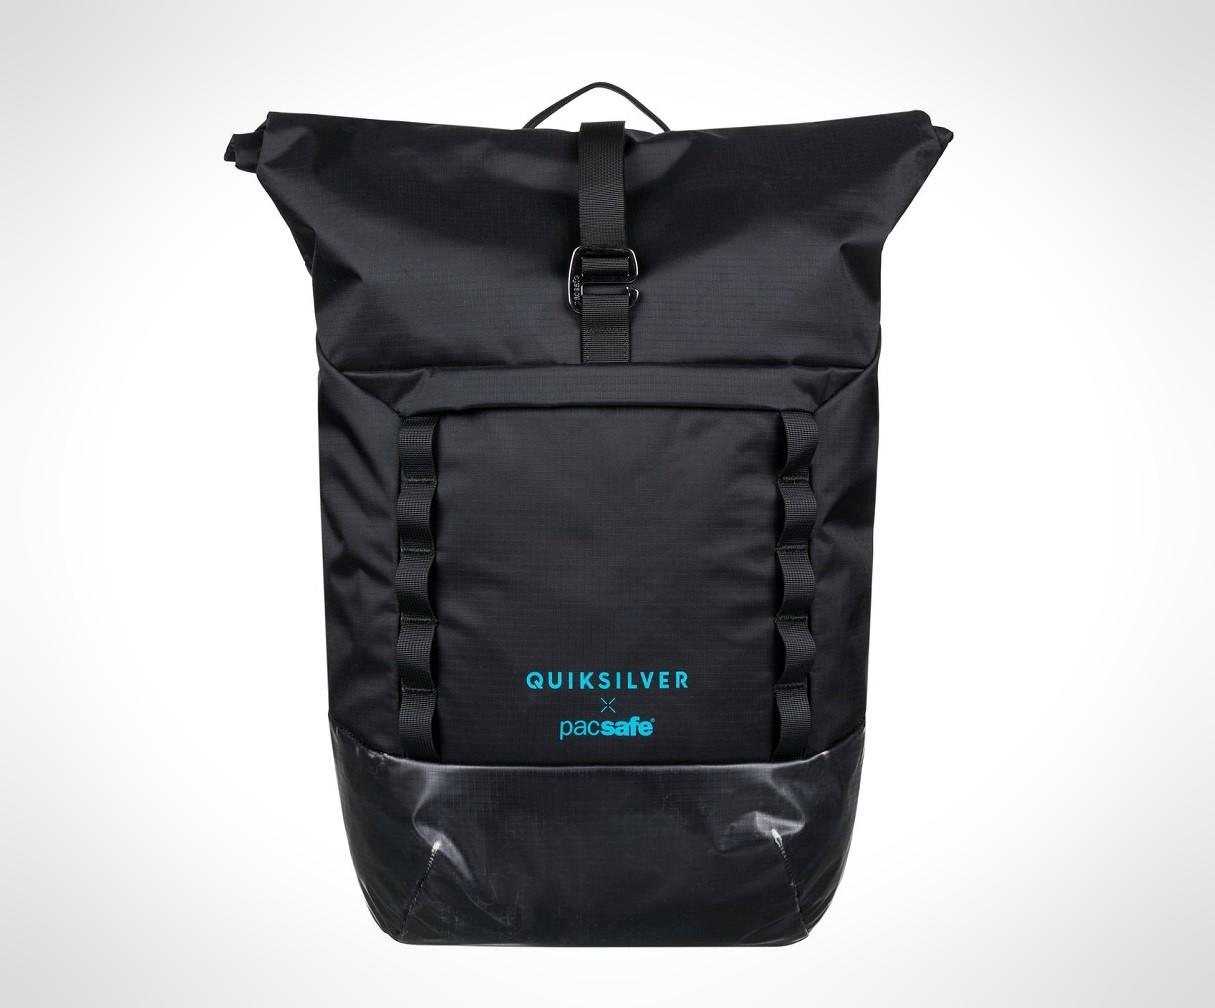 backpacks-bags-commuters-mens-quiksilver-pacsafe